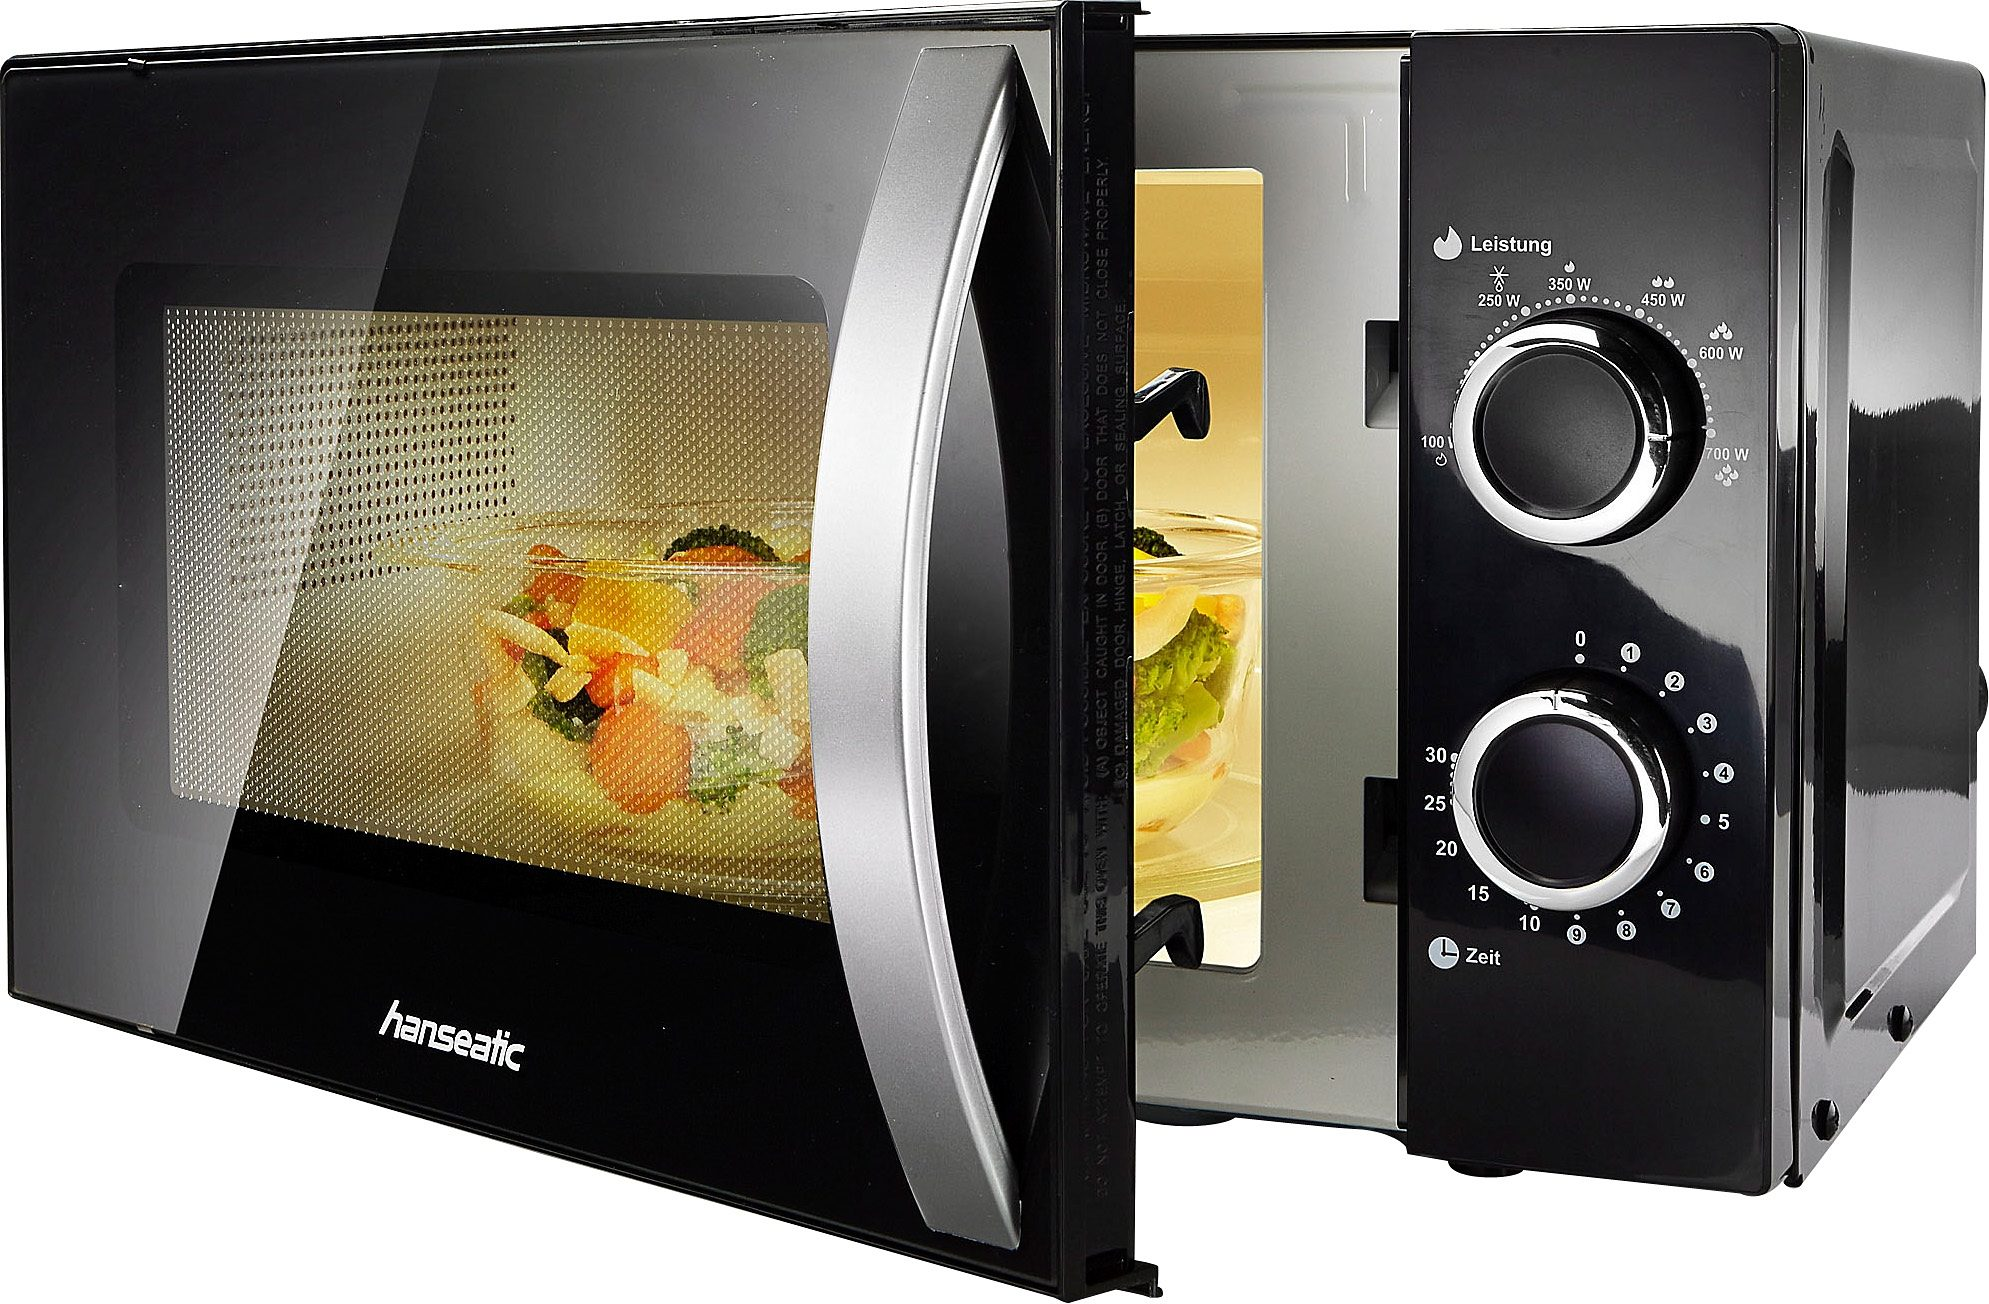 Hanseatic Mikrowelle SMH207P3H-P schwarz, 700 W, Auftaufunktion